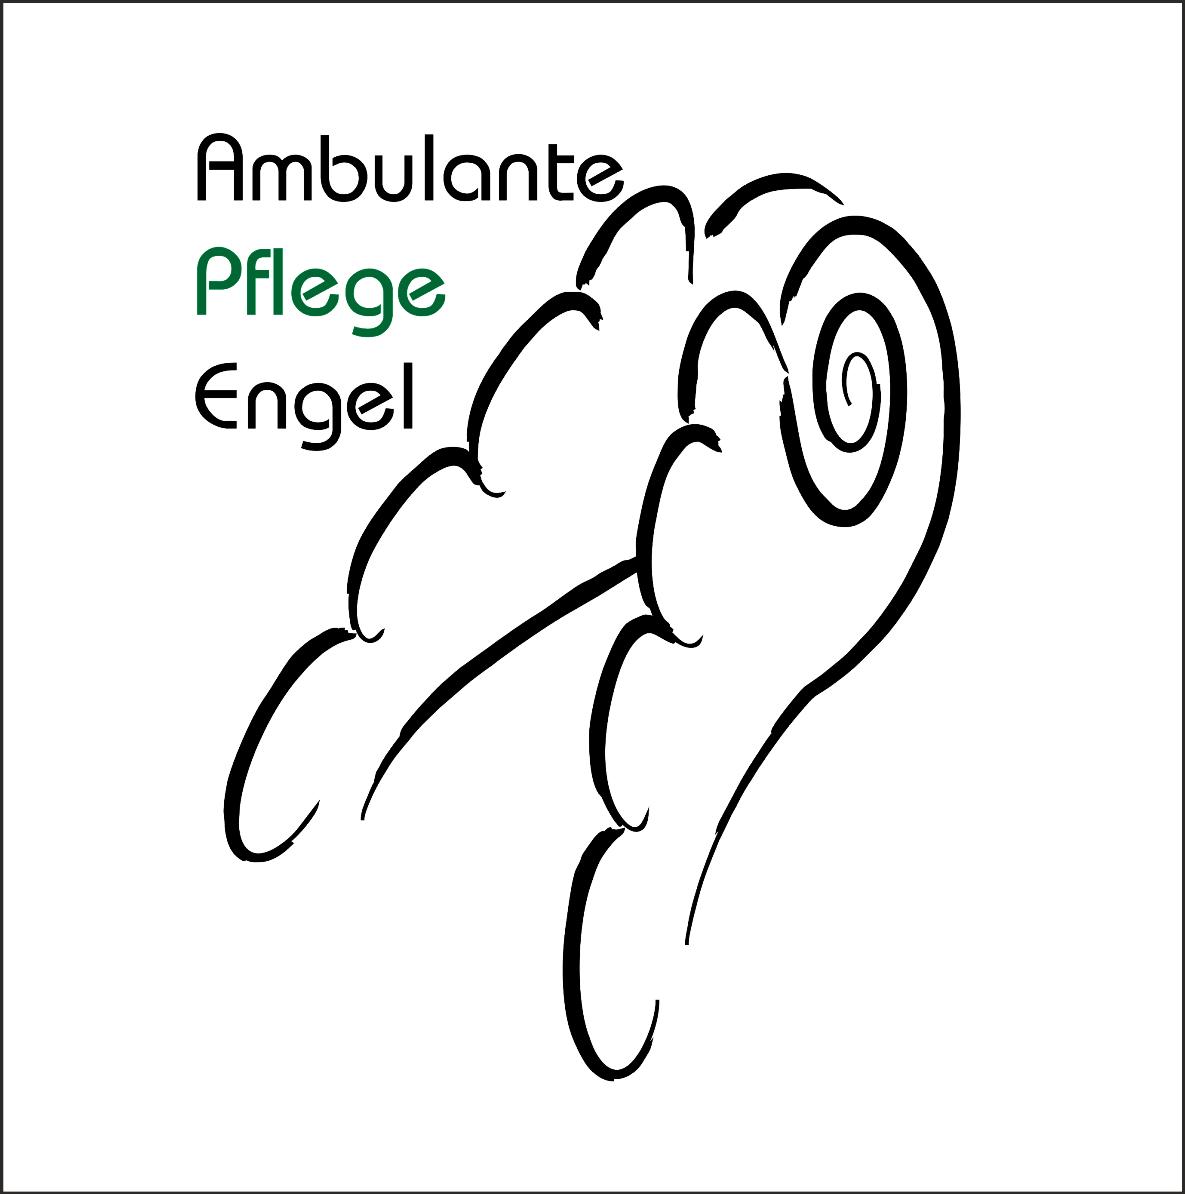 Ambulante Pflegeengel